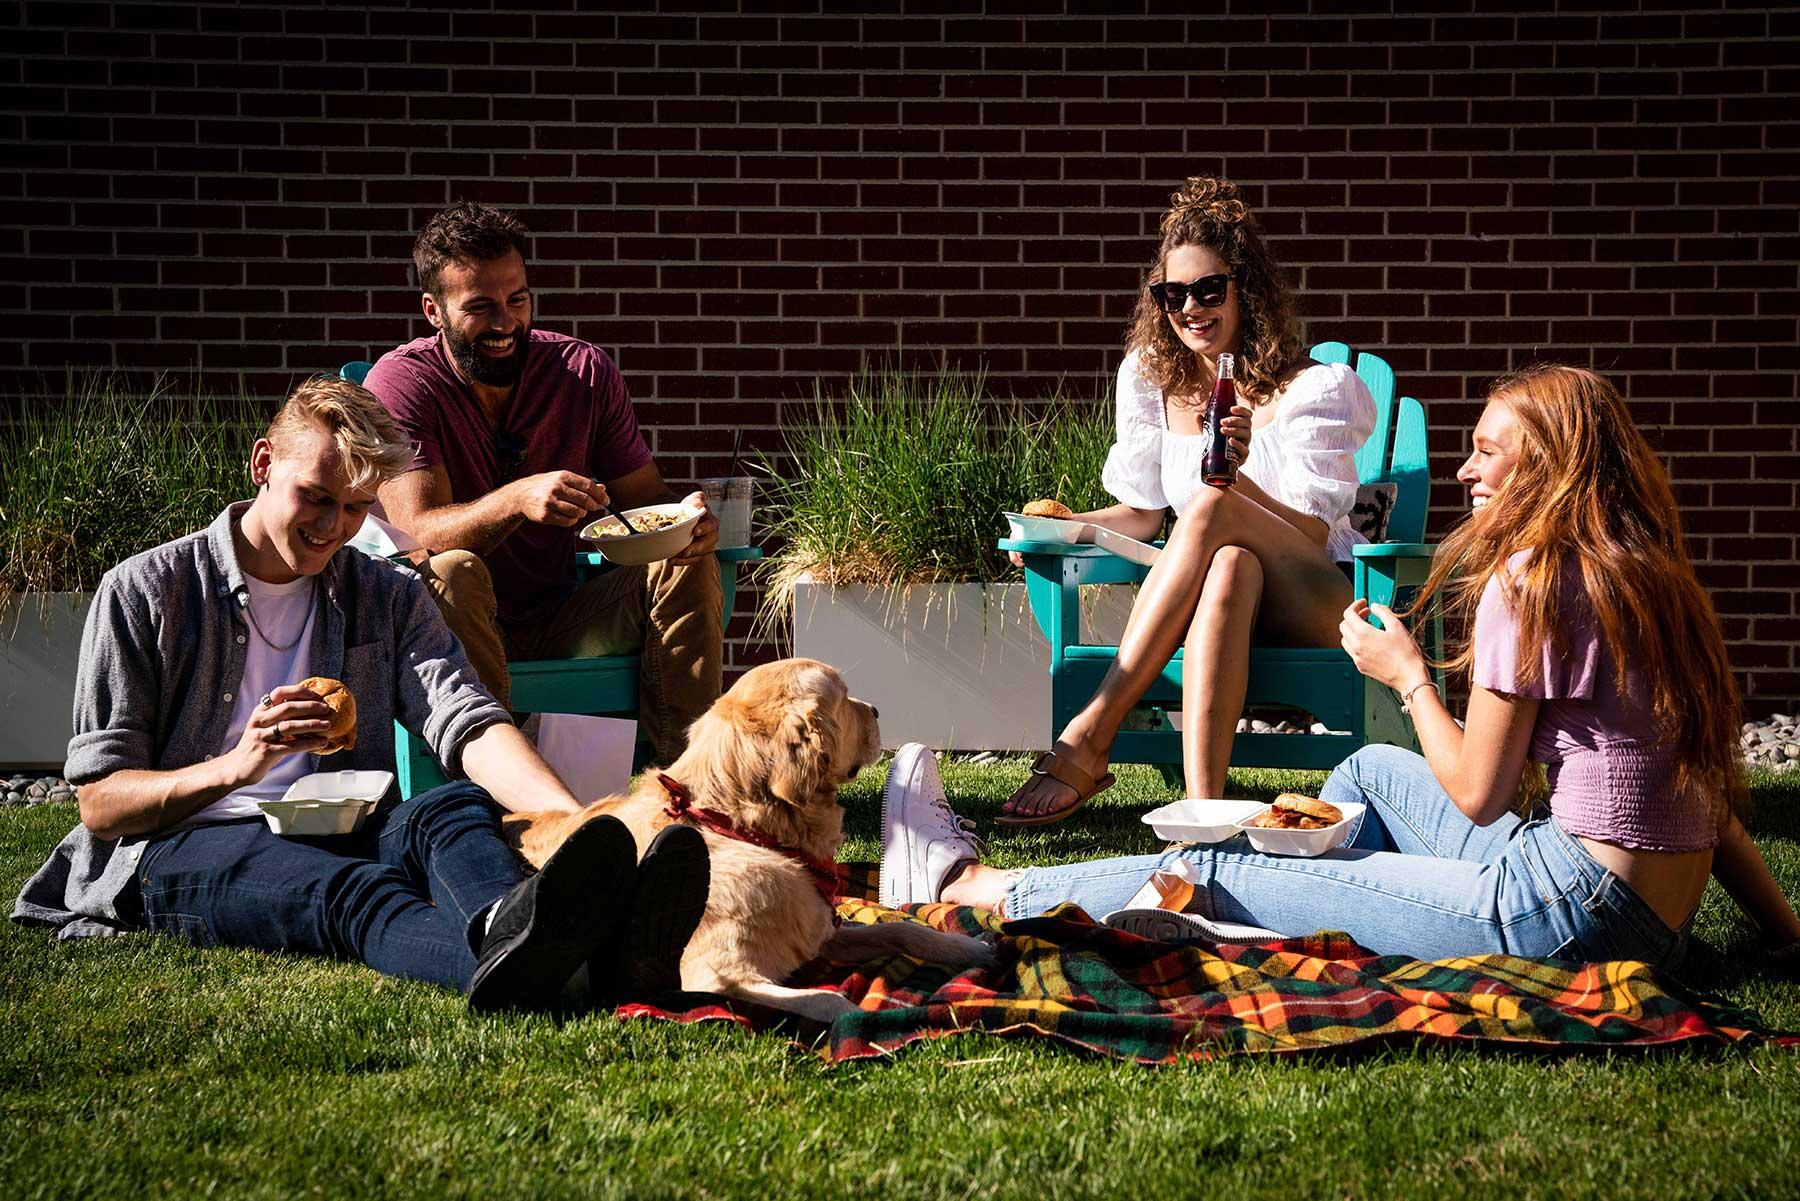 People having a picnic